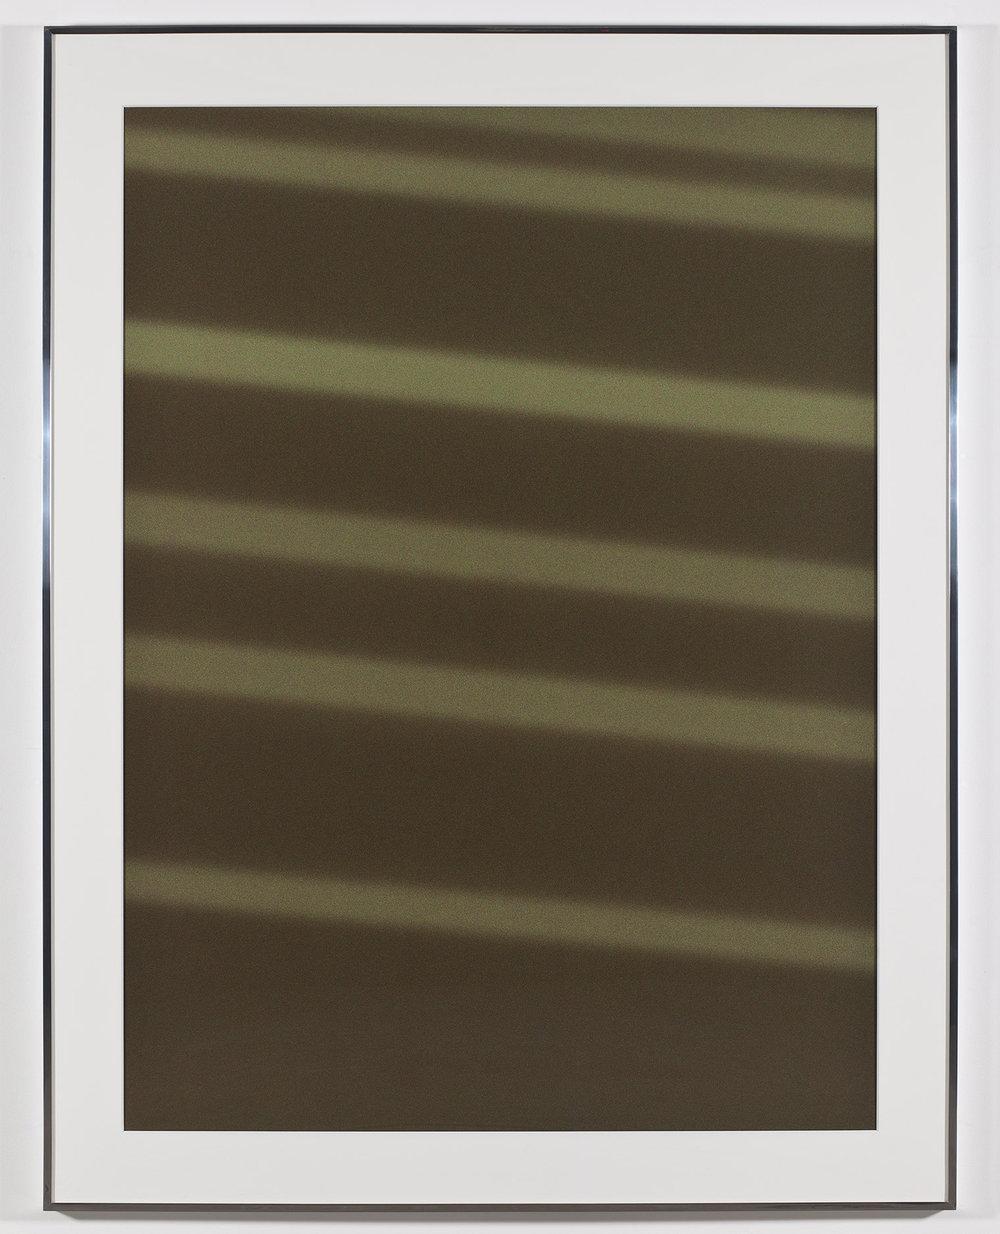 Transparency (Negative) [Kodak Portra 400NC Em. No. 2031: April 25–27, 2010 LAX/JFK BOS/SFO SFO/LAX]   2011  Epson Ultrachrome K3 archival ink jet print on Museo Silver Rag Paper  68 x 52 1/4 inches   Transparencies, 2008–2014    Diapositives, 2011